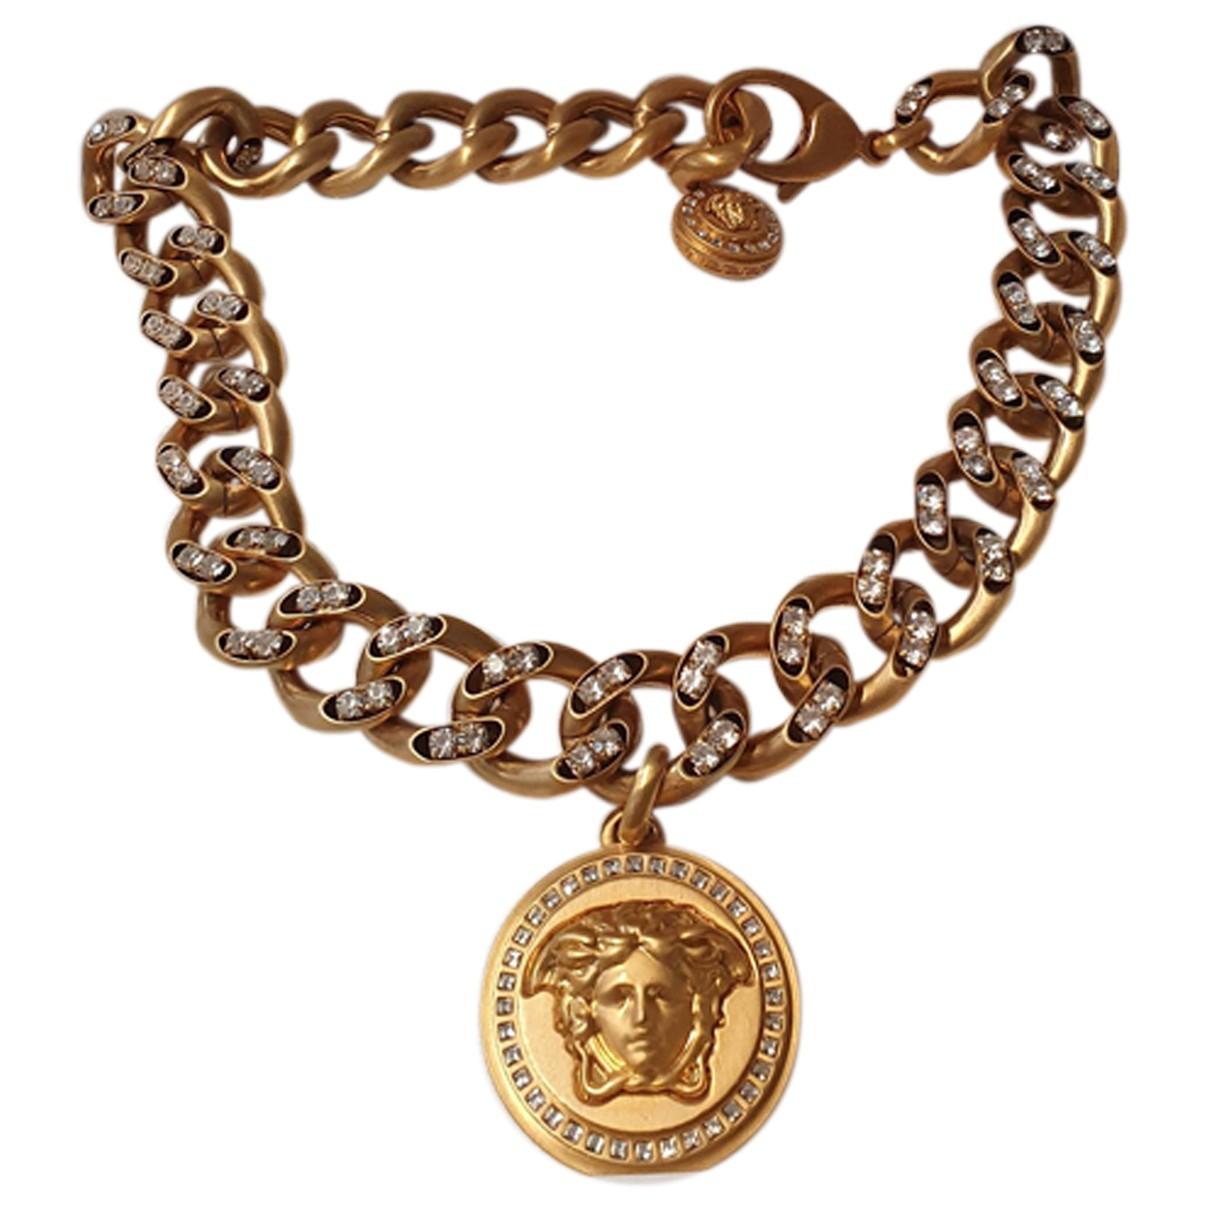 Collar Gianni Versace